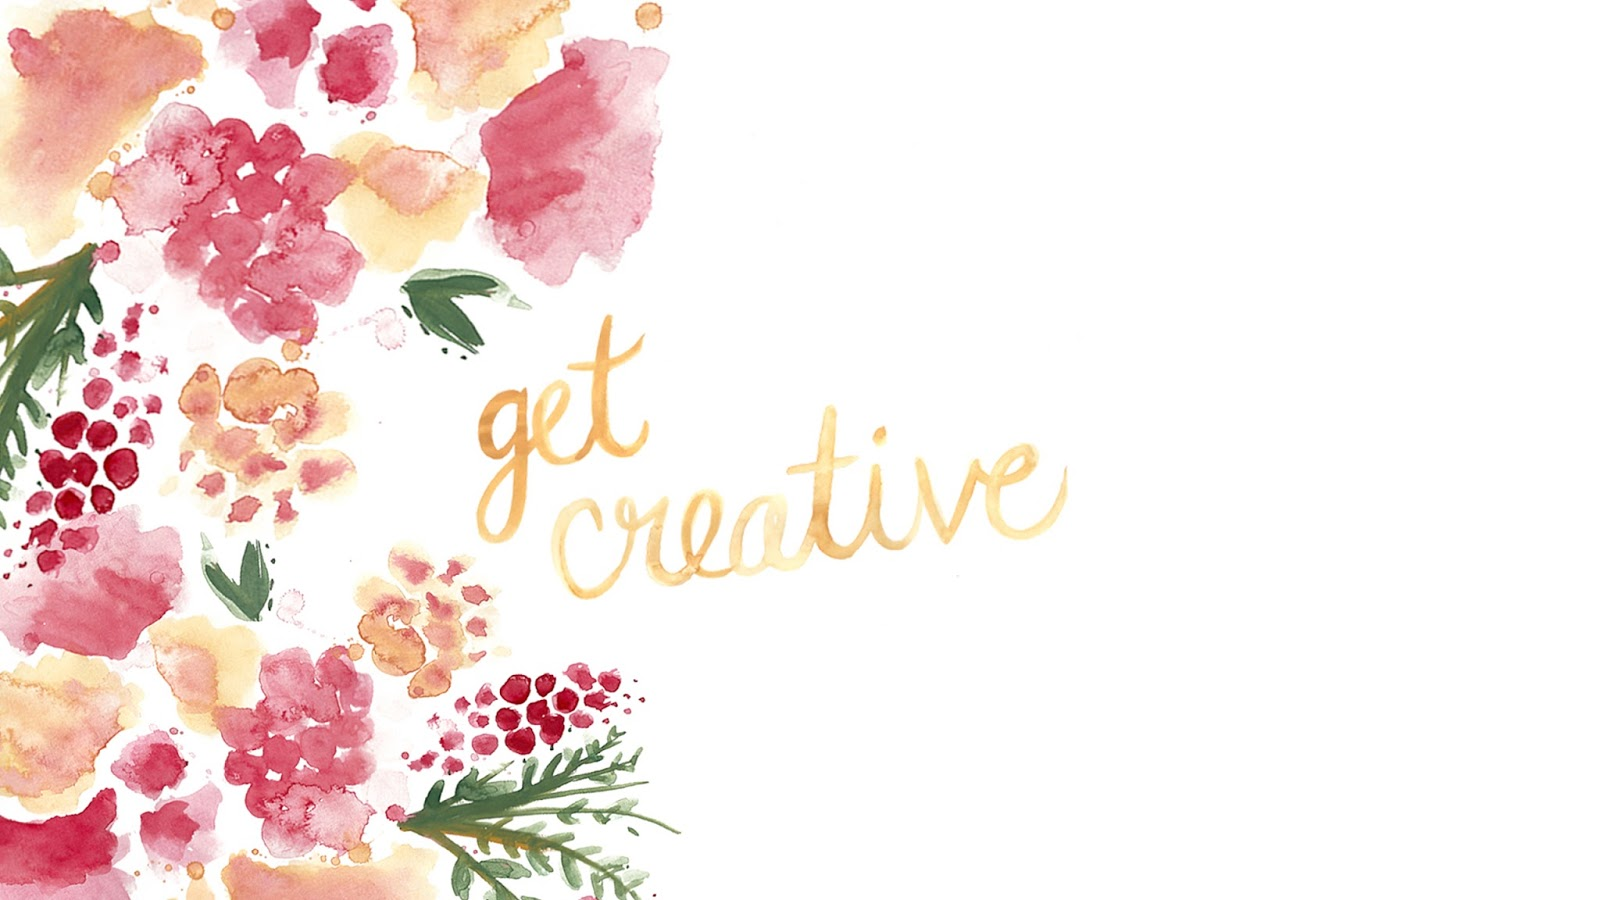 1000+ Images About Desktop On Pinterest